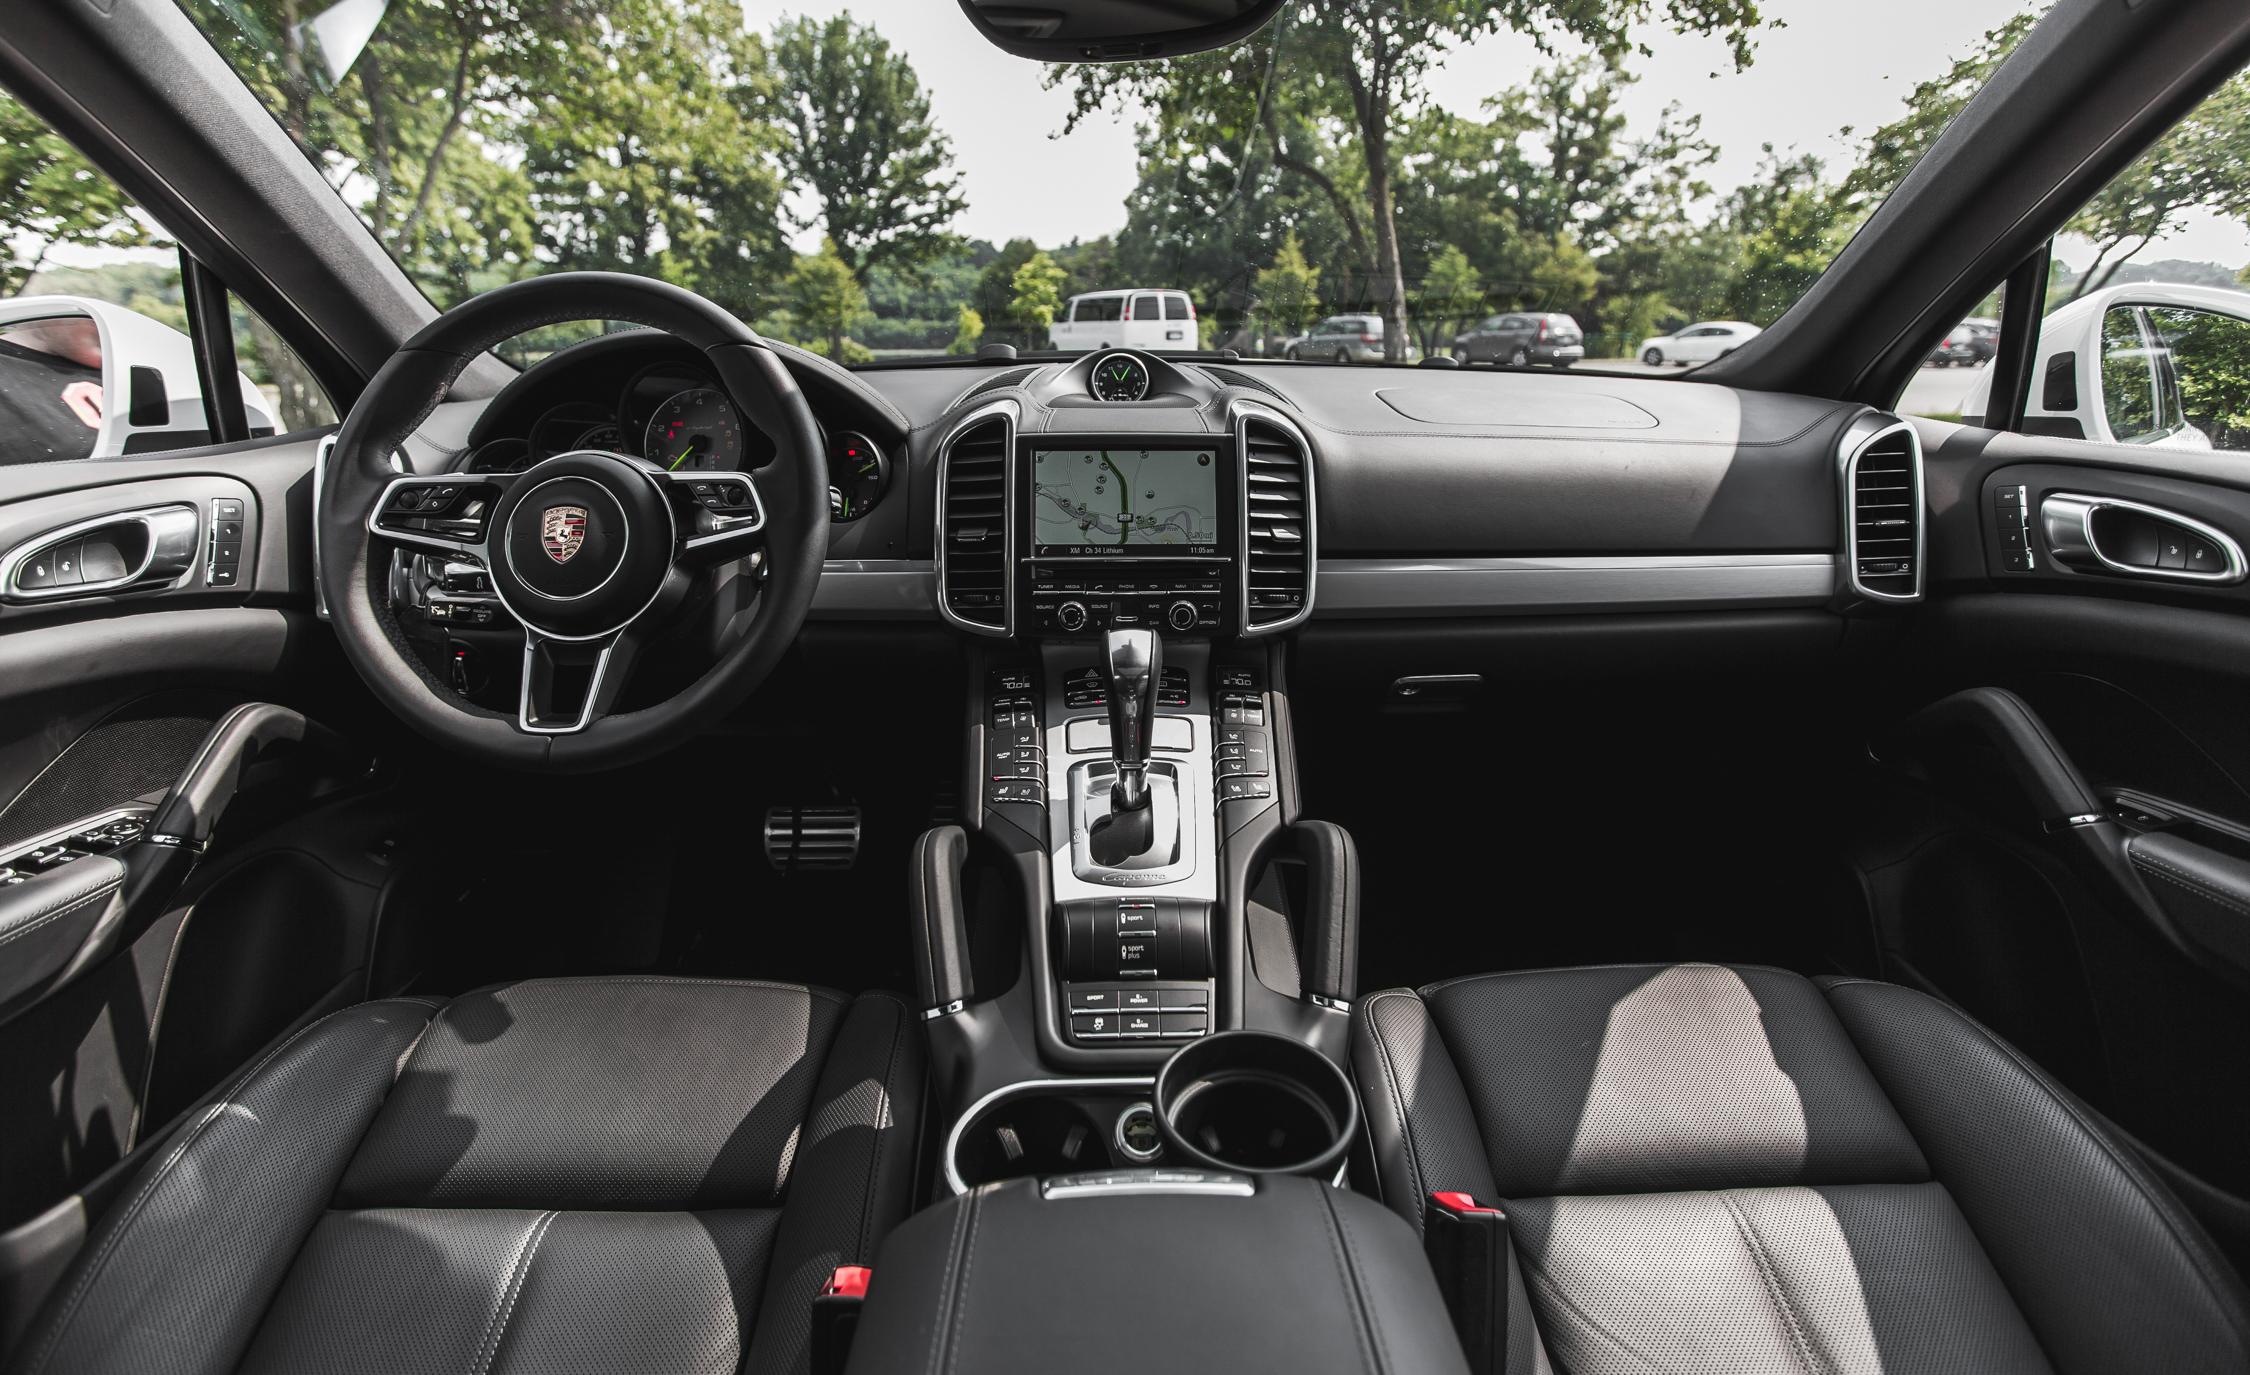 2015 Porsche Cayenne S E-Hybrid Interior